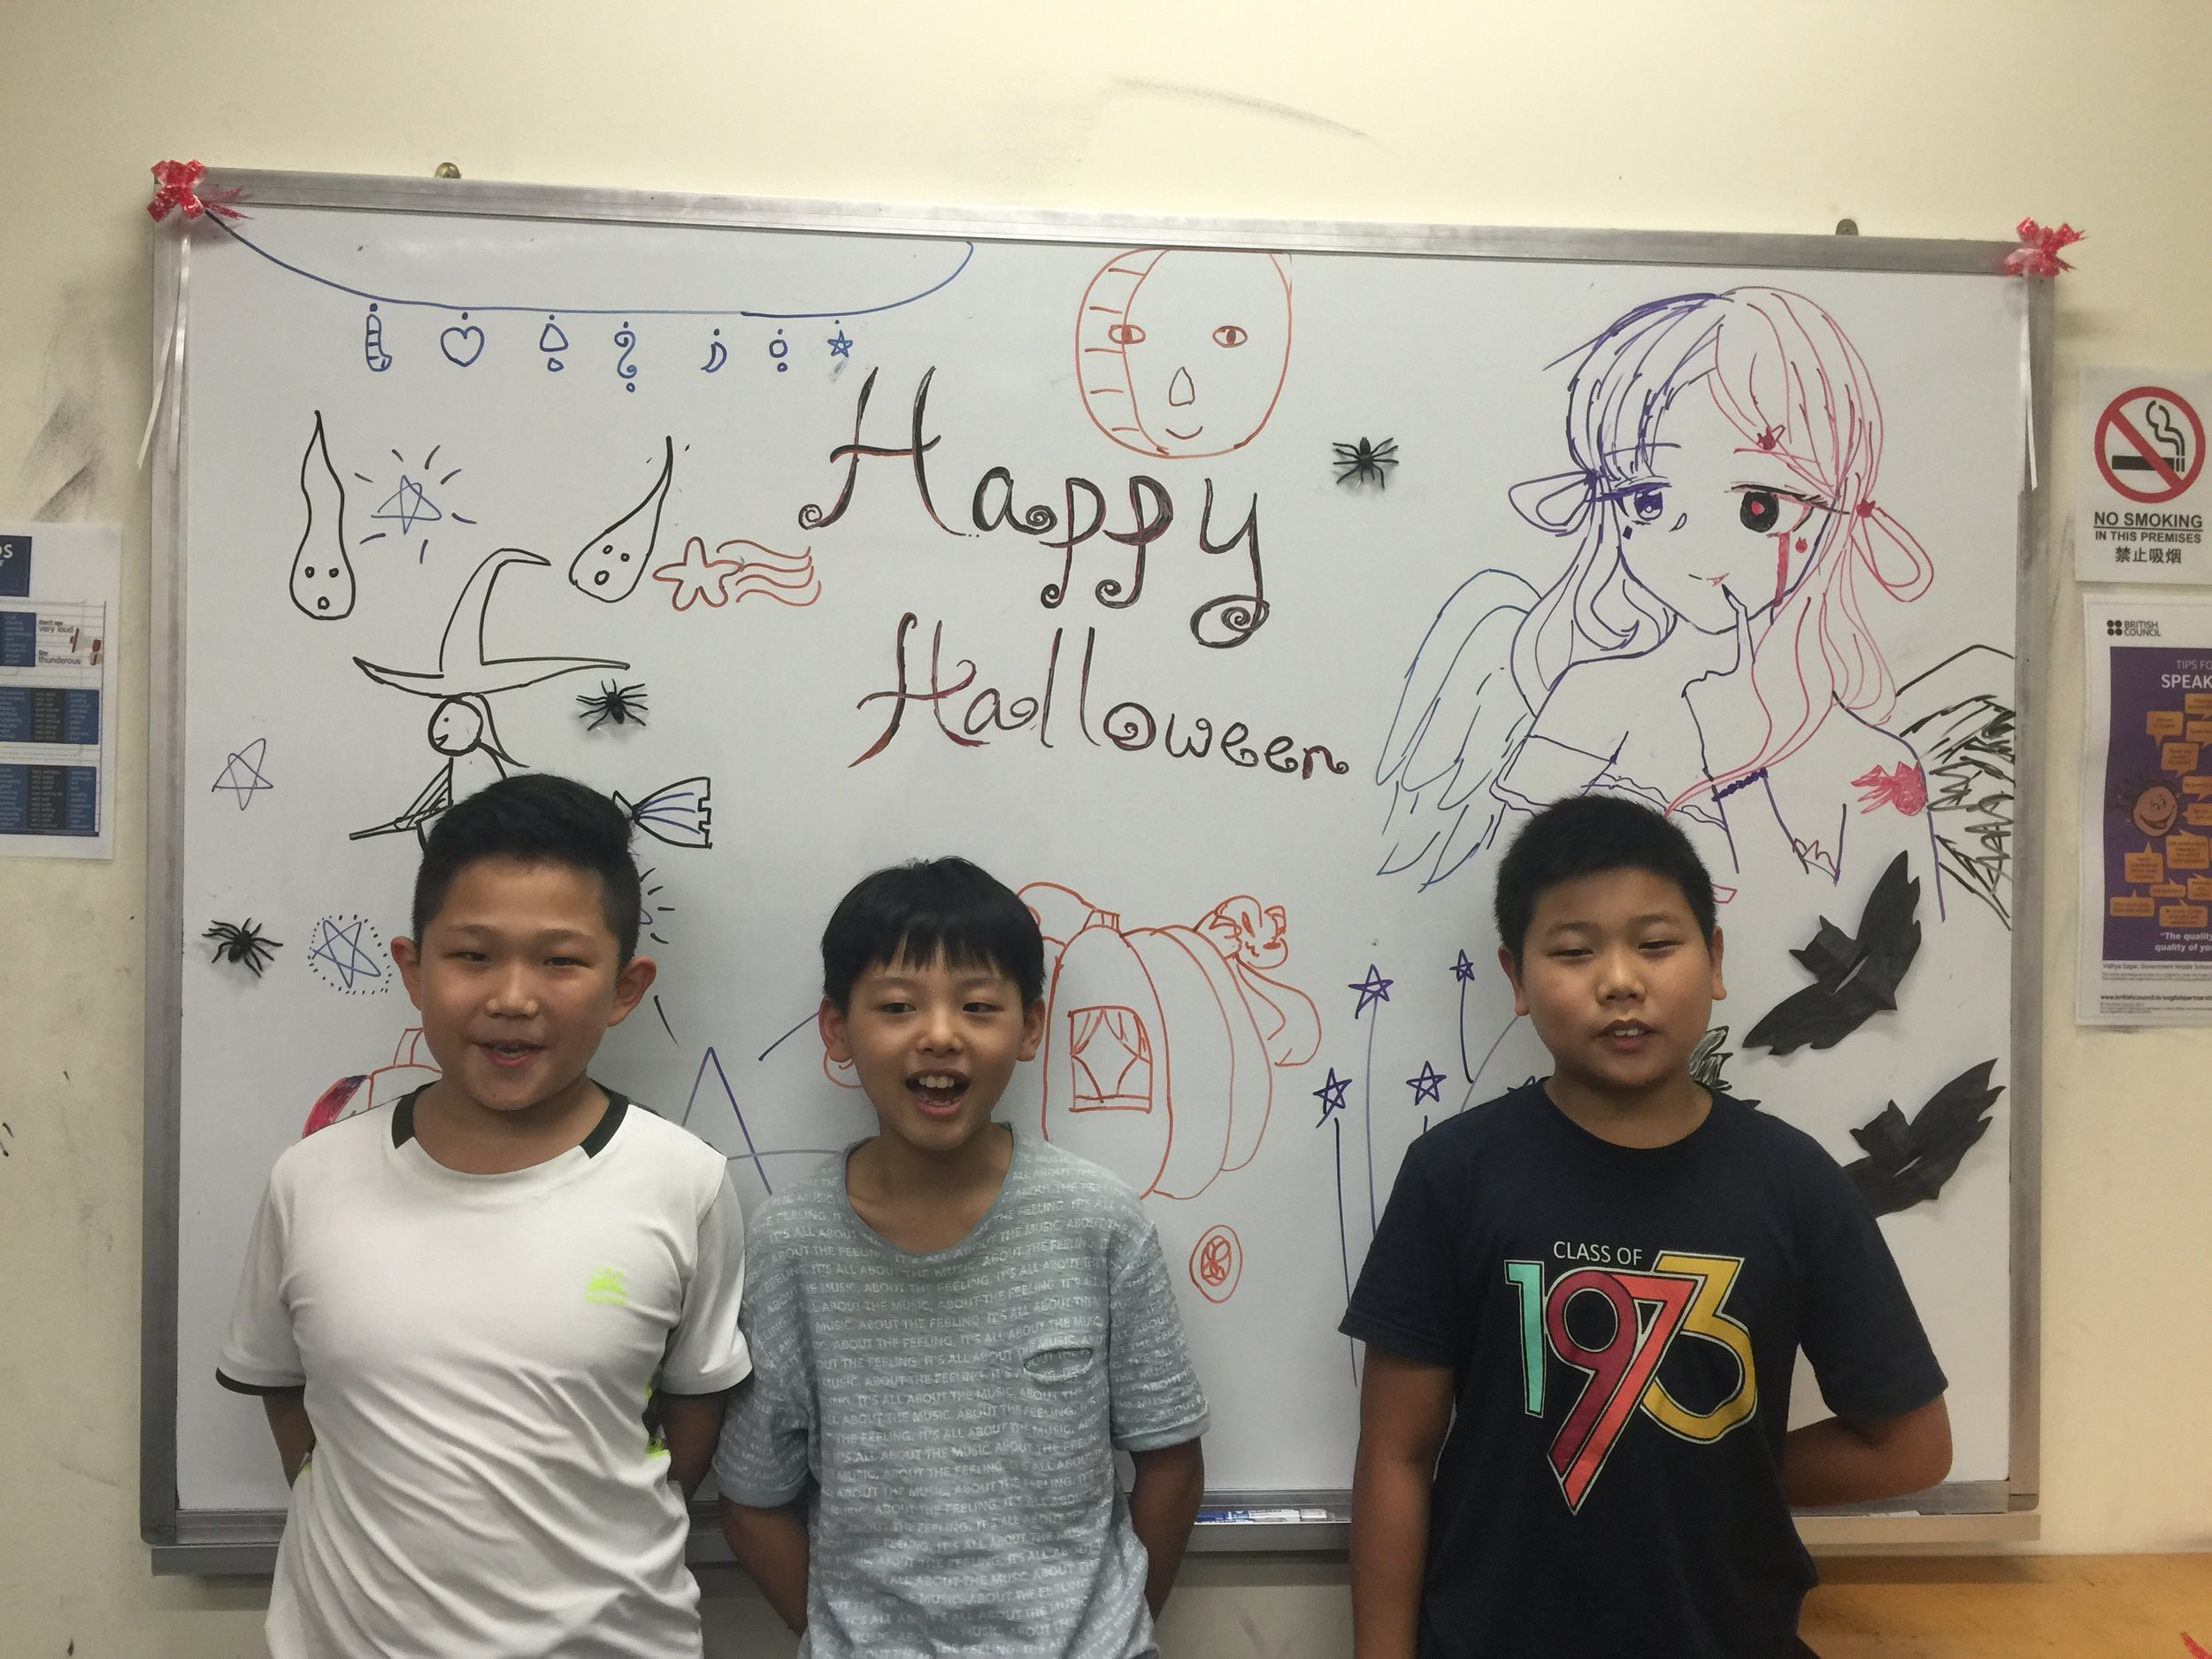 Happy Halloween_P5 Math class (4).JPG